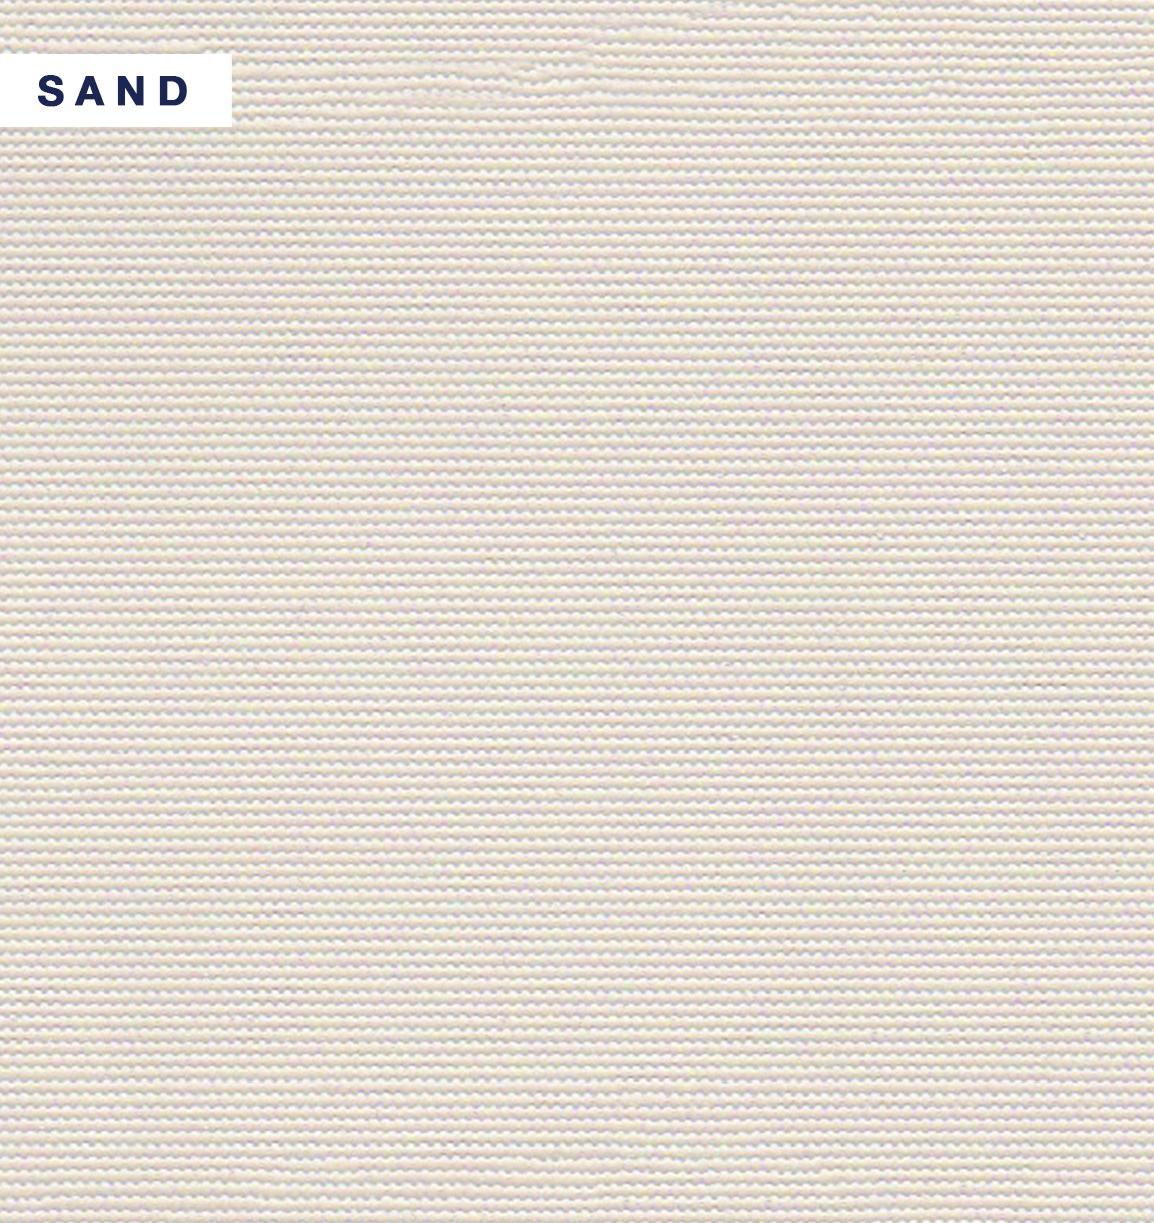 One Block - Sand.jpg